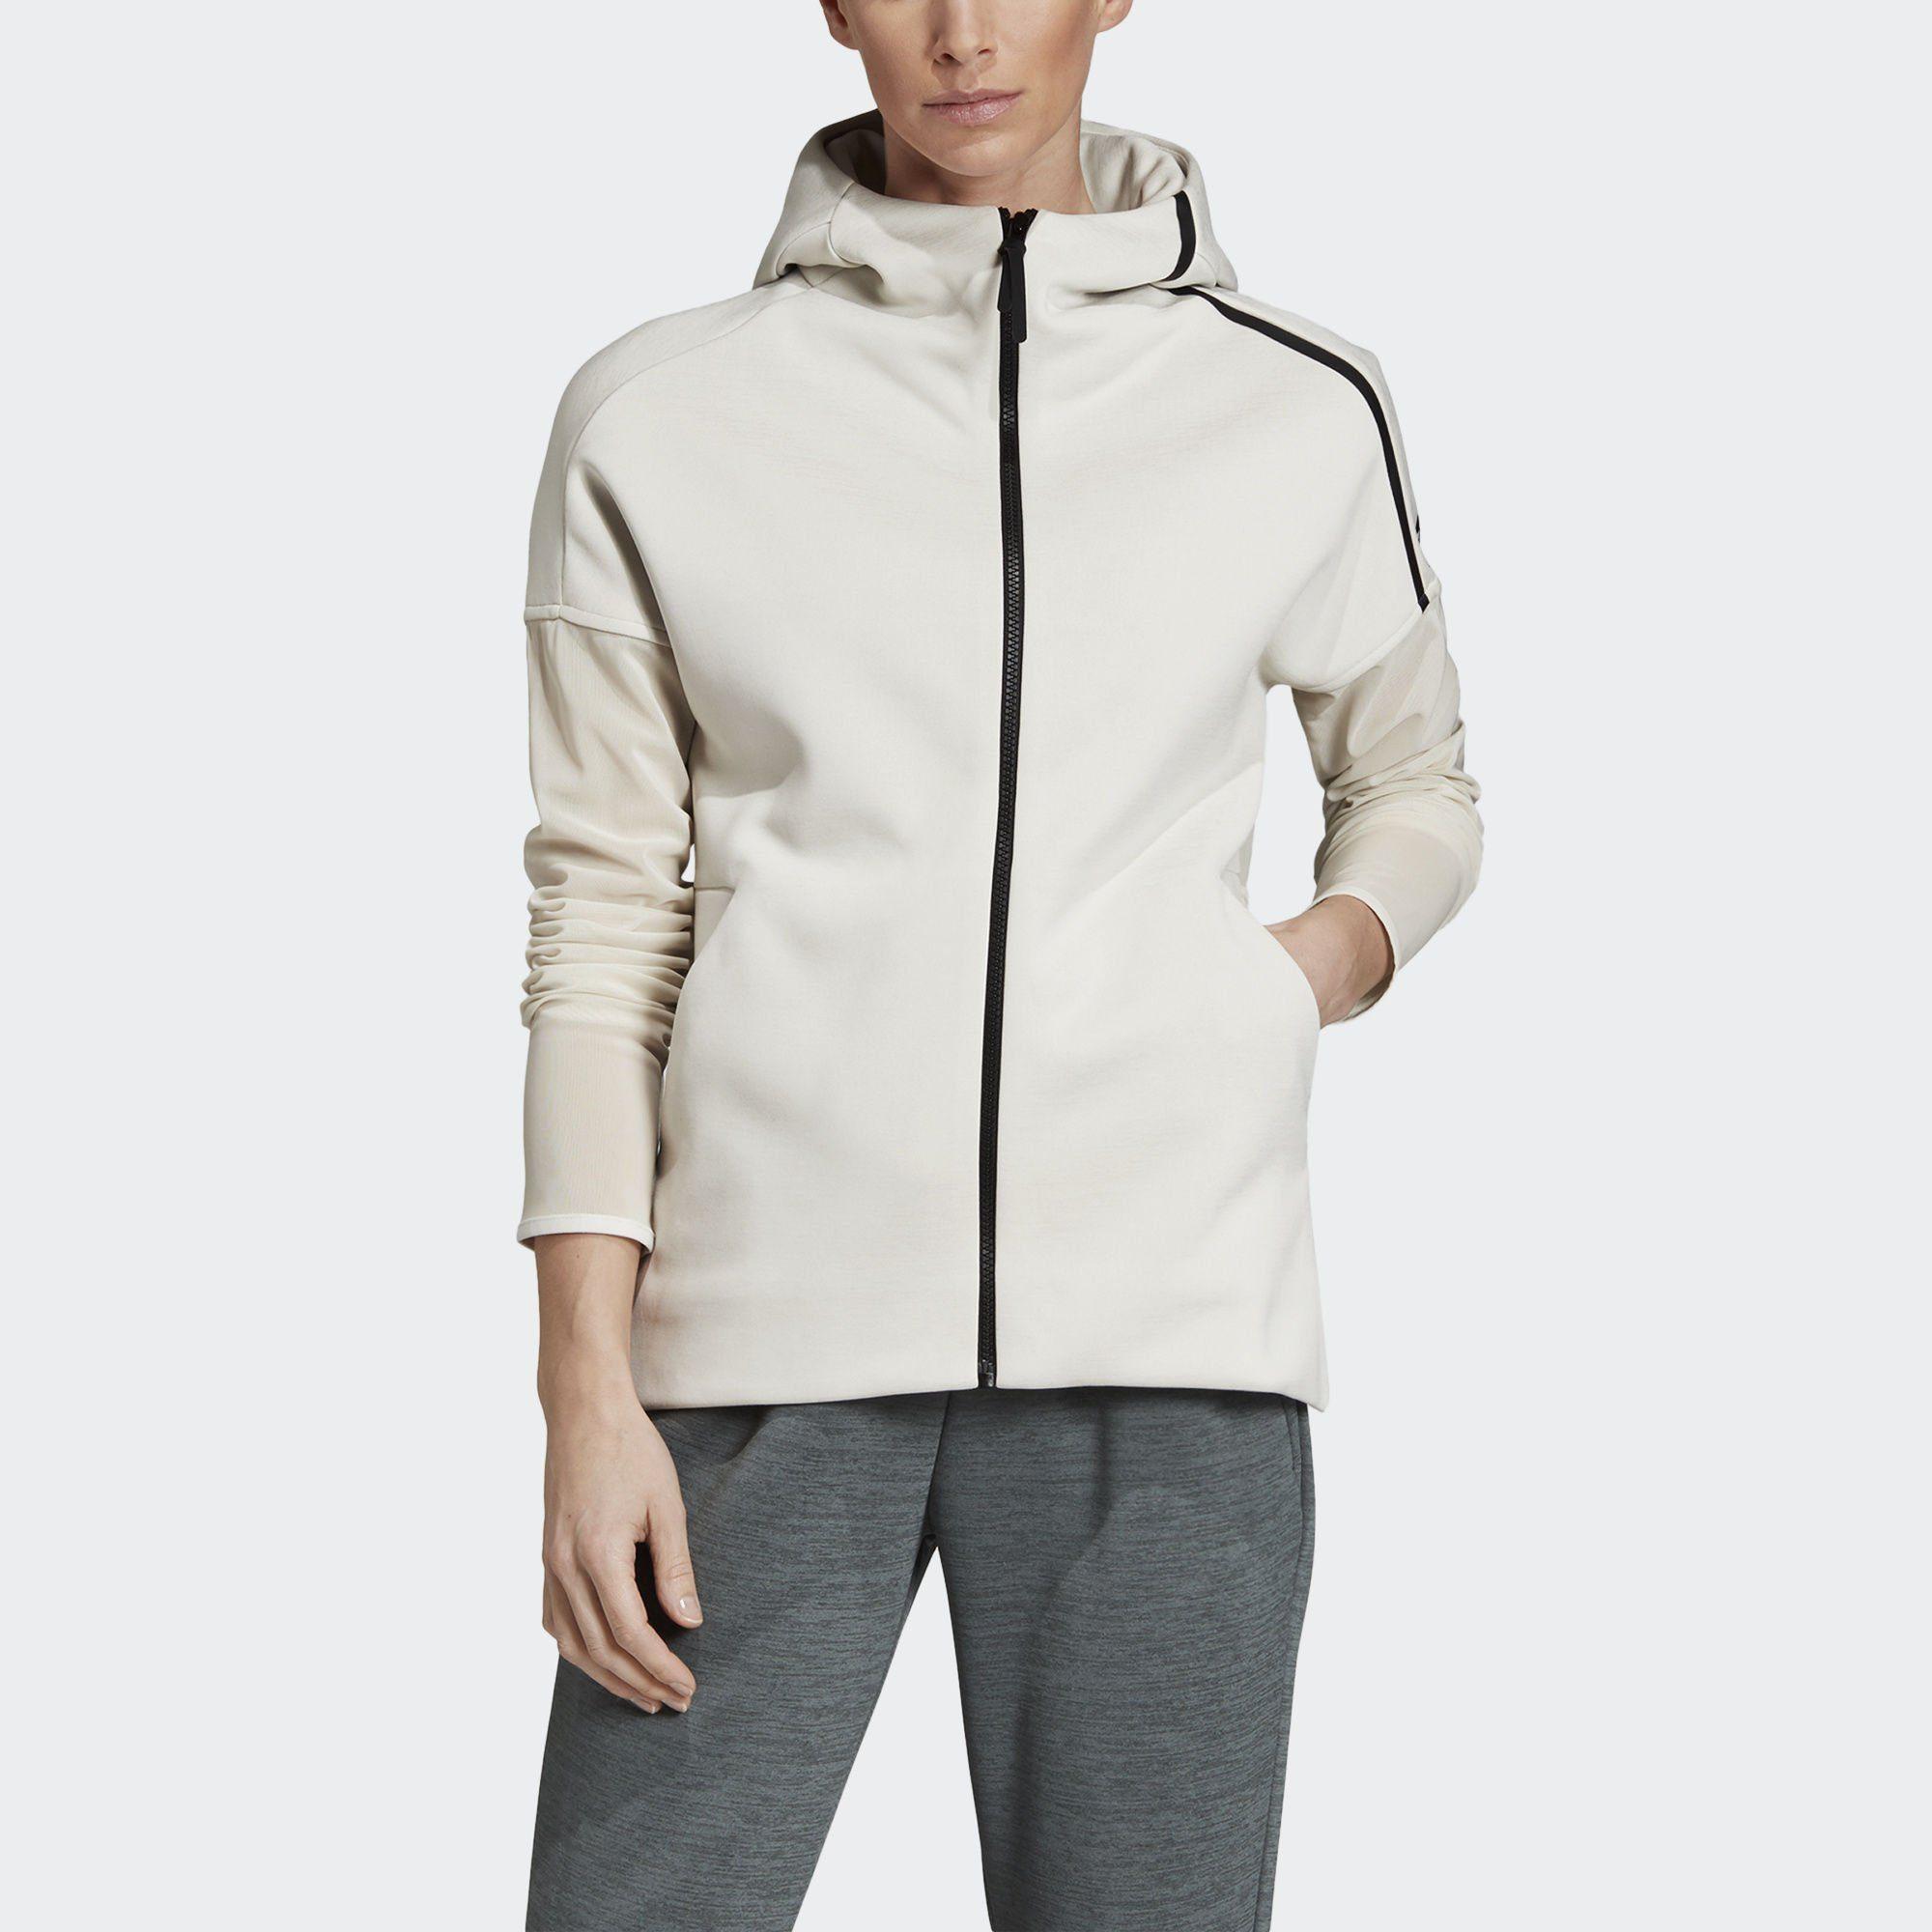 Adidas Z.N.E. Parley Hoodie ab 75,99 ?   Preisvergleich bei